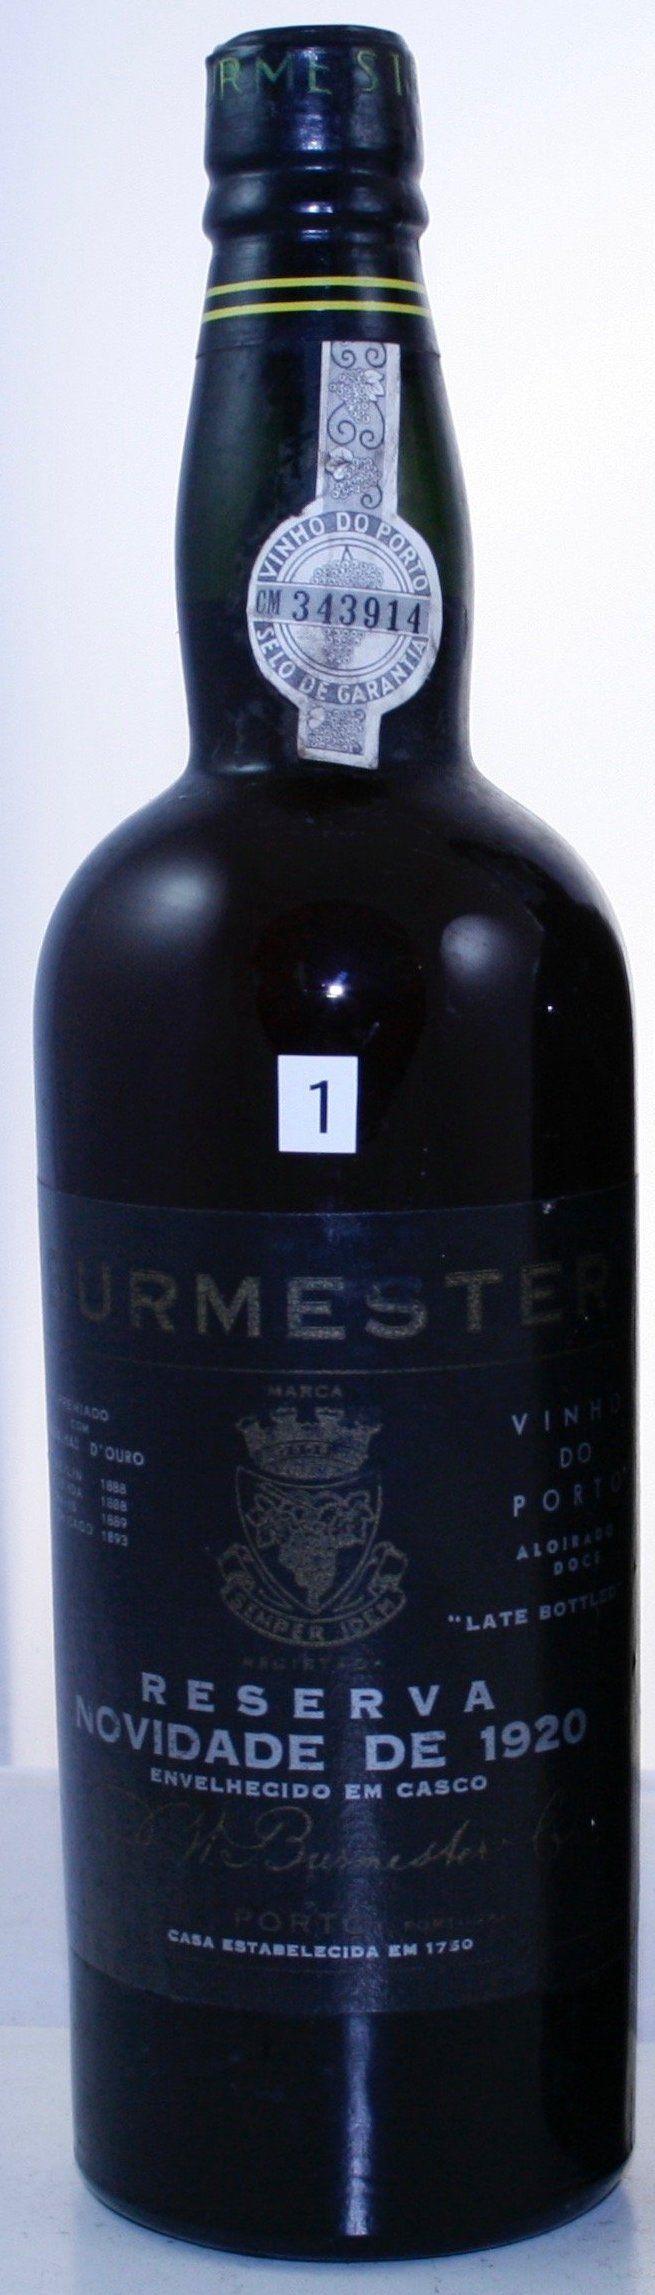 395,- Euro Burmester Novidade Reserva Port ahrgang:1920 Land:Portugal Region:Porto Produzent:J.W. Burmester Typ:weiß Alkoholgehalt:20% Füllhöhe:TS - top-shoulder Etikett:Good Labels